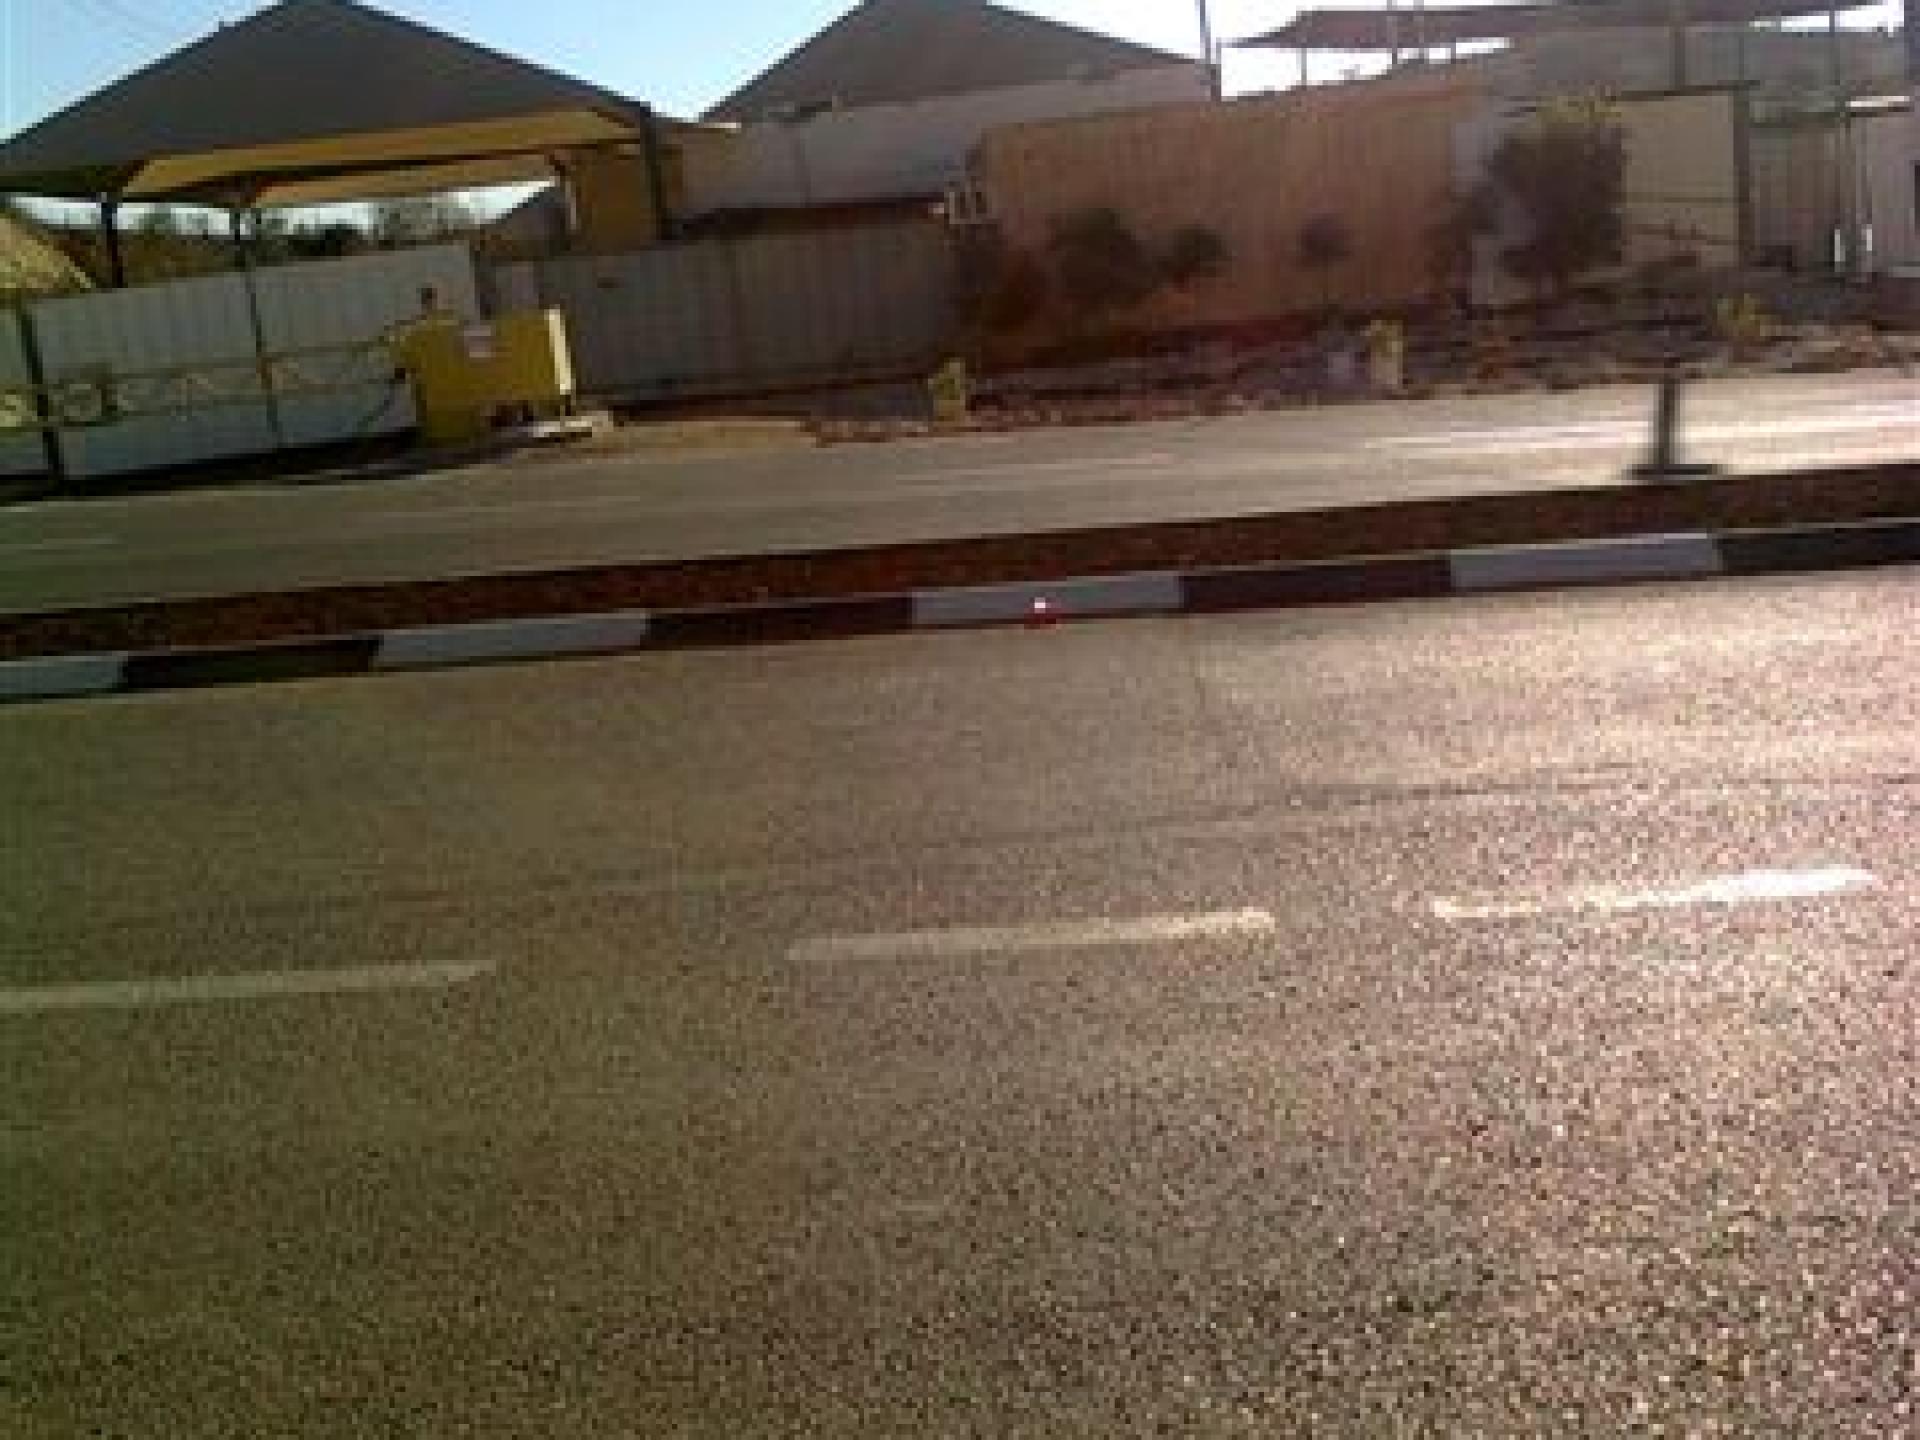 Barta'a/Reikhan checkpoint 04.12.10